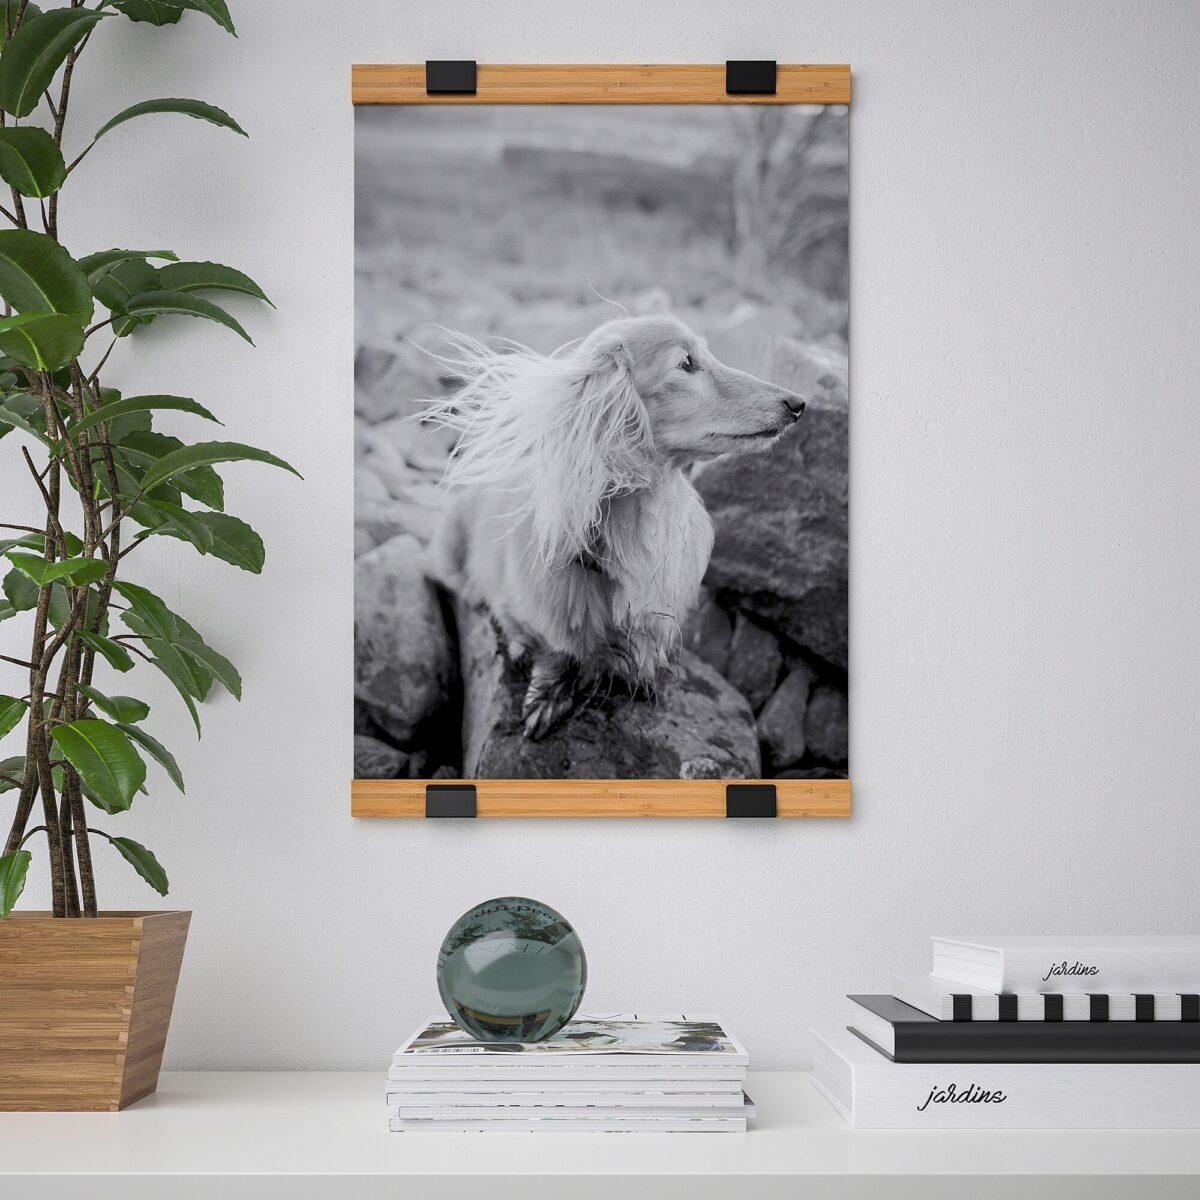 ikea-visbaeck-aste-porta-poster-bambu